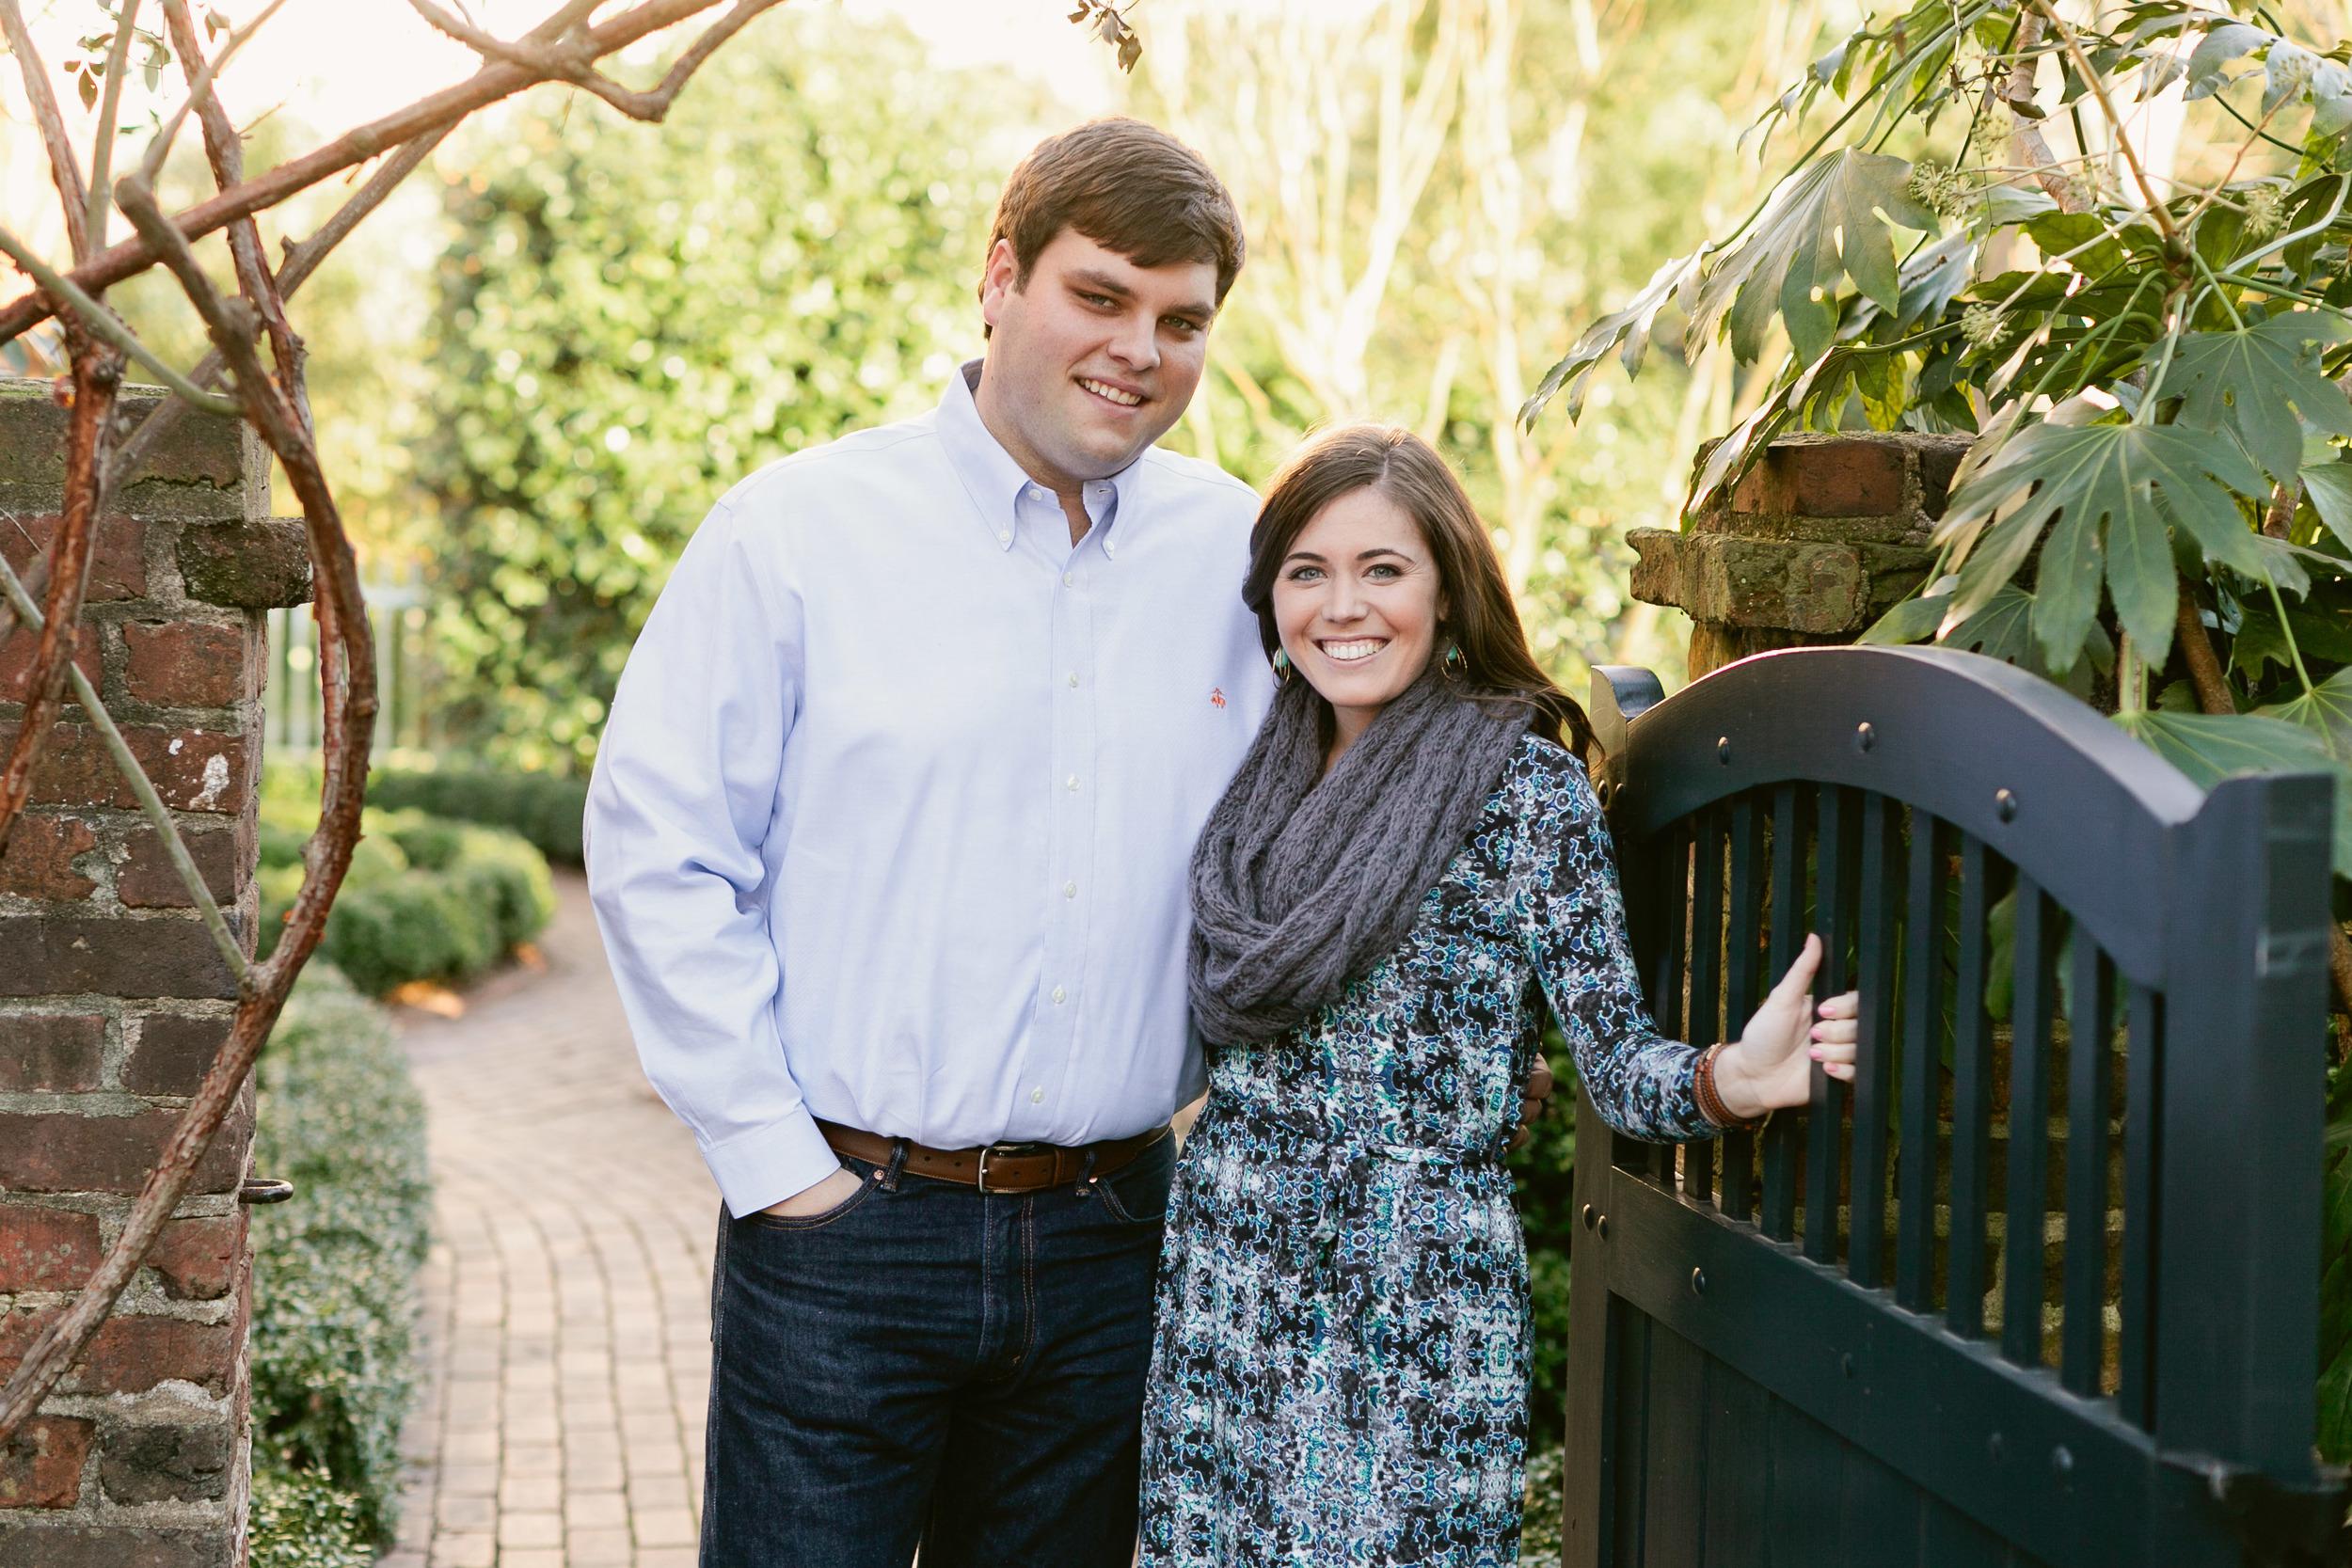 Atlanta-Engagement-Photographer-Athens-Georgia-Jittery-Joes-downtown-Athens-Founders-Memorial-Garden-30.jpg